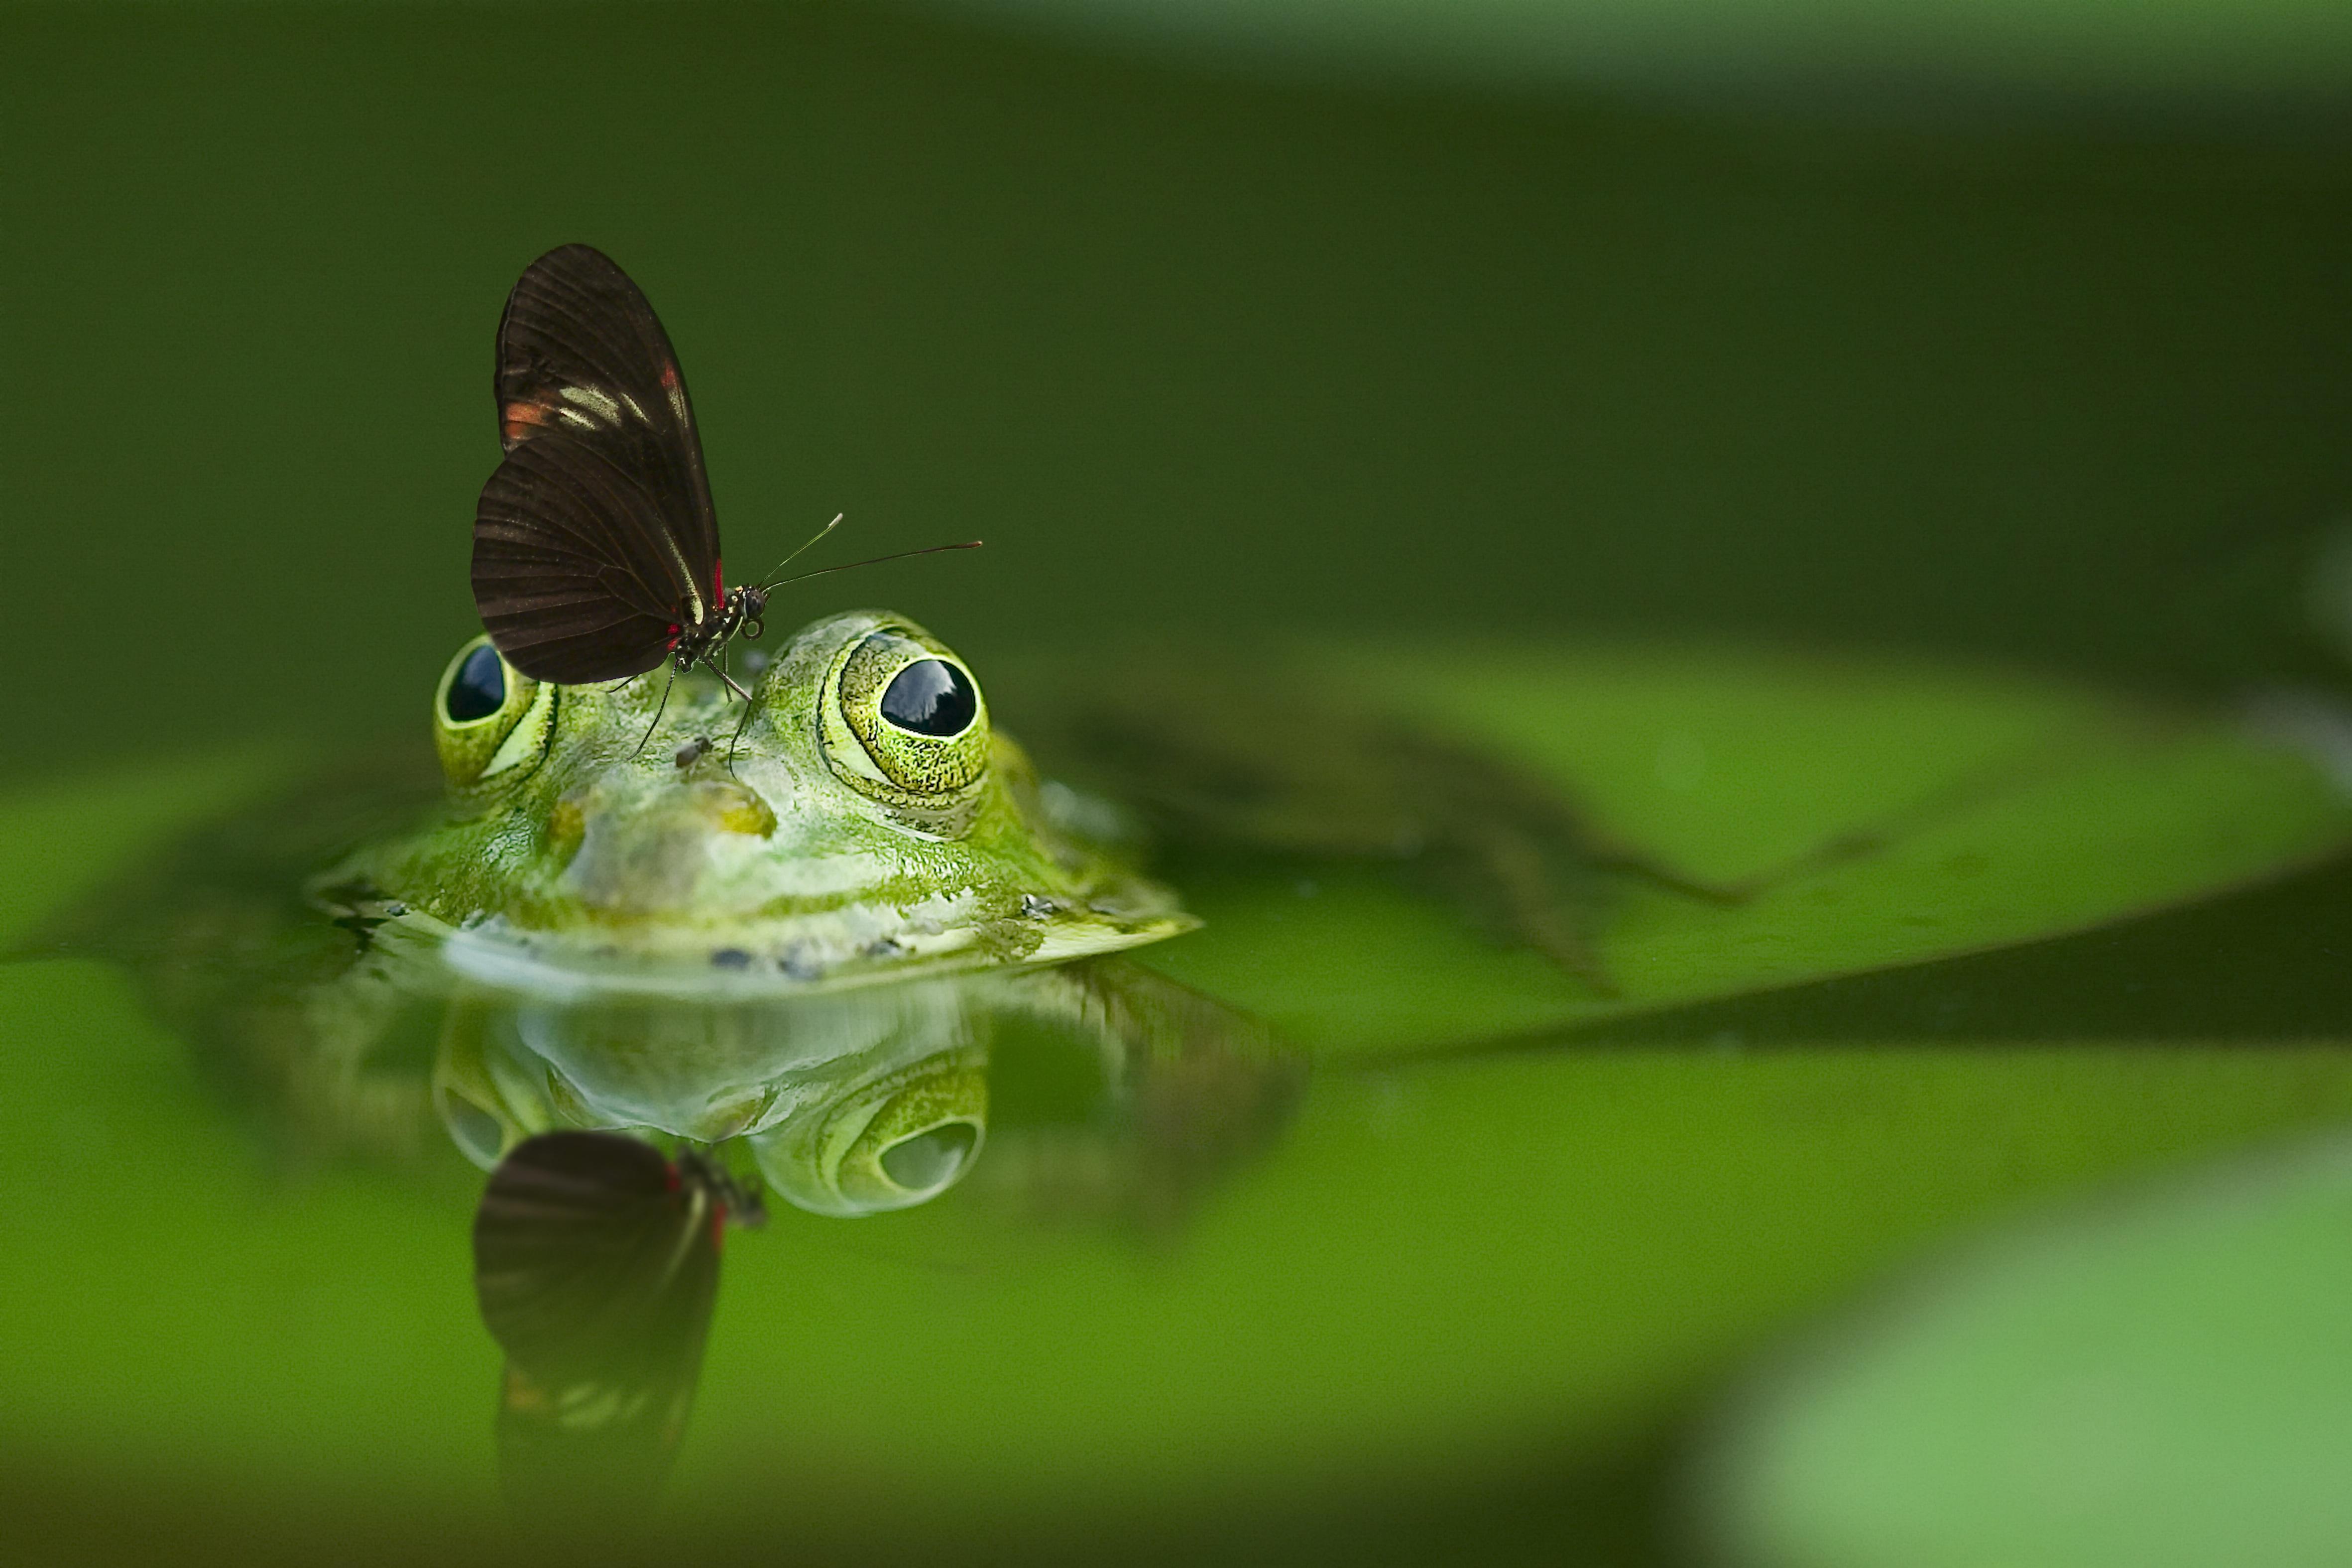 frog chant gratefulness org